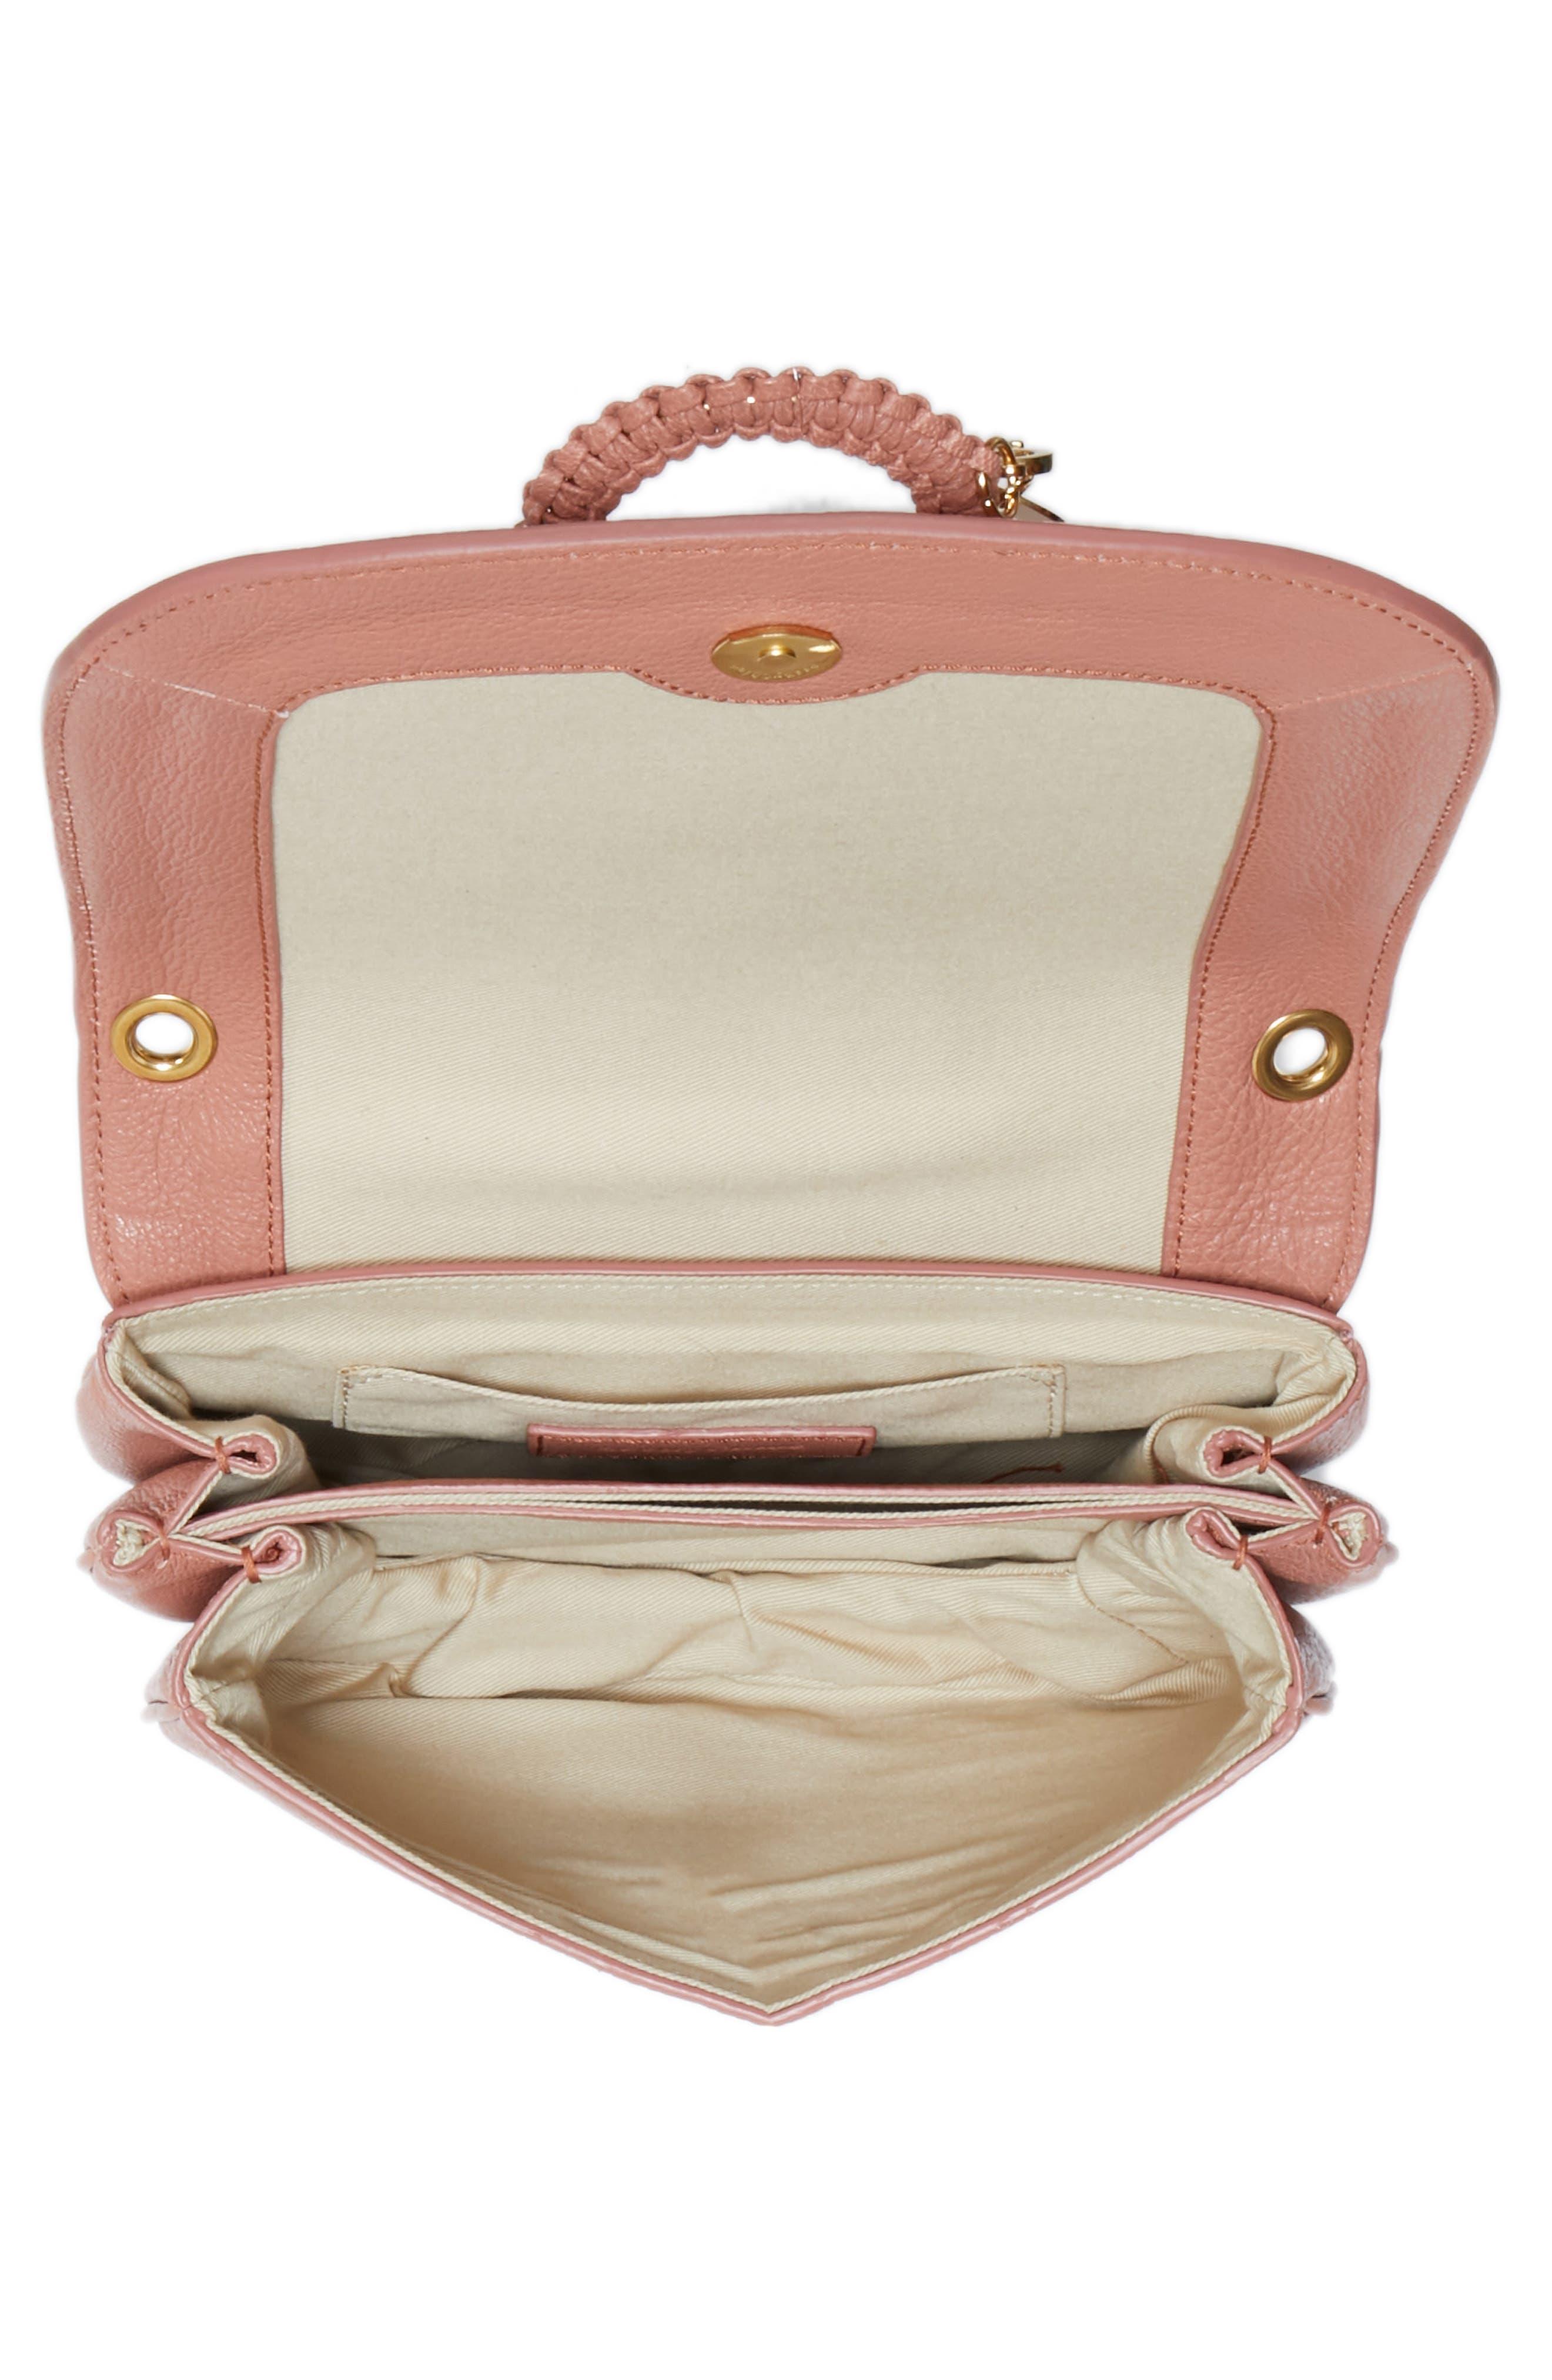 Hana Small Leather Crossbody Bag,                             Alternate thumbnail 23, color,